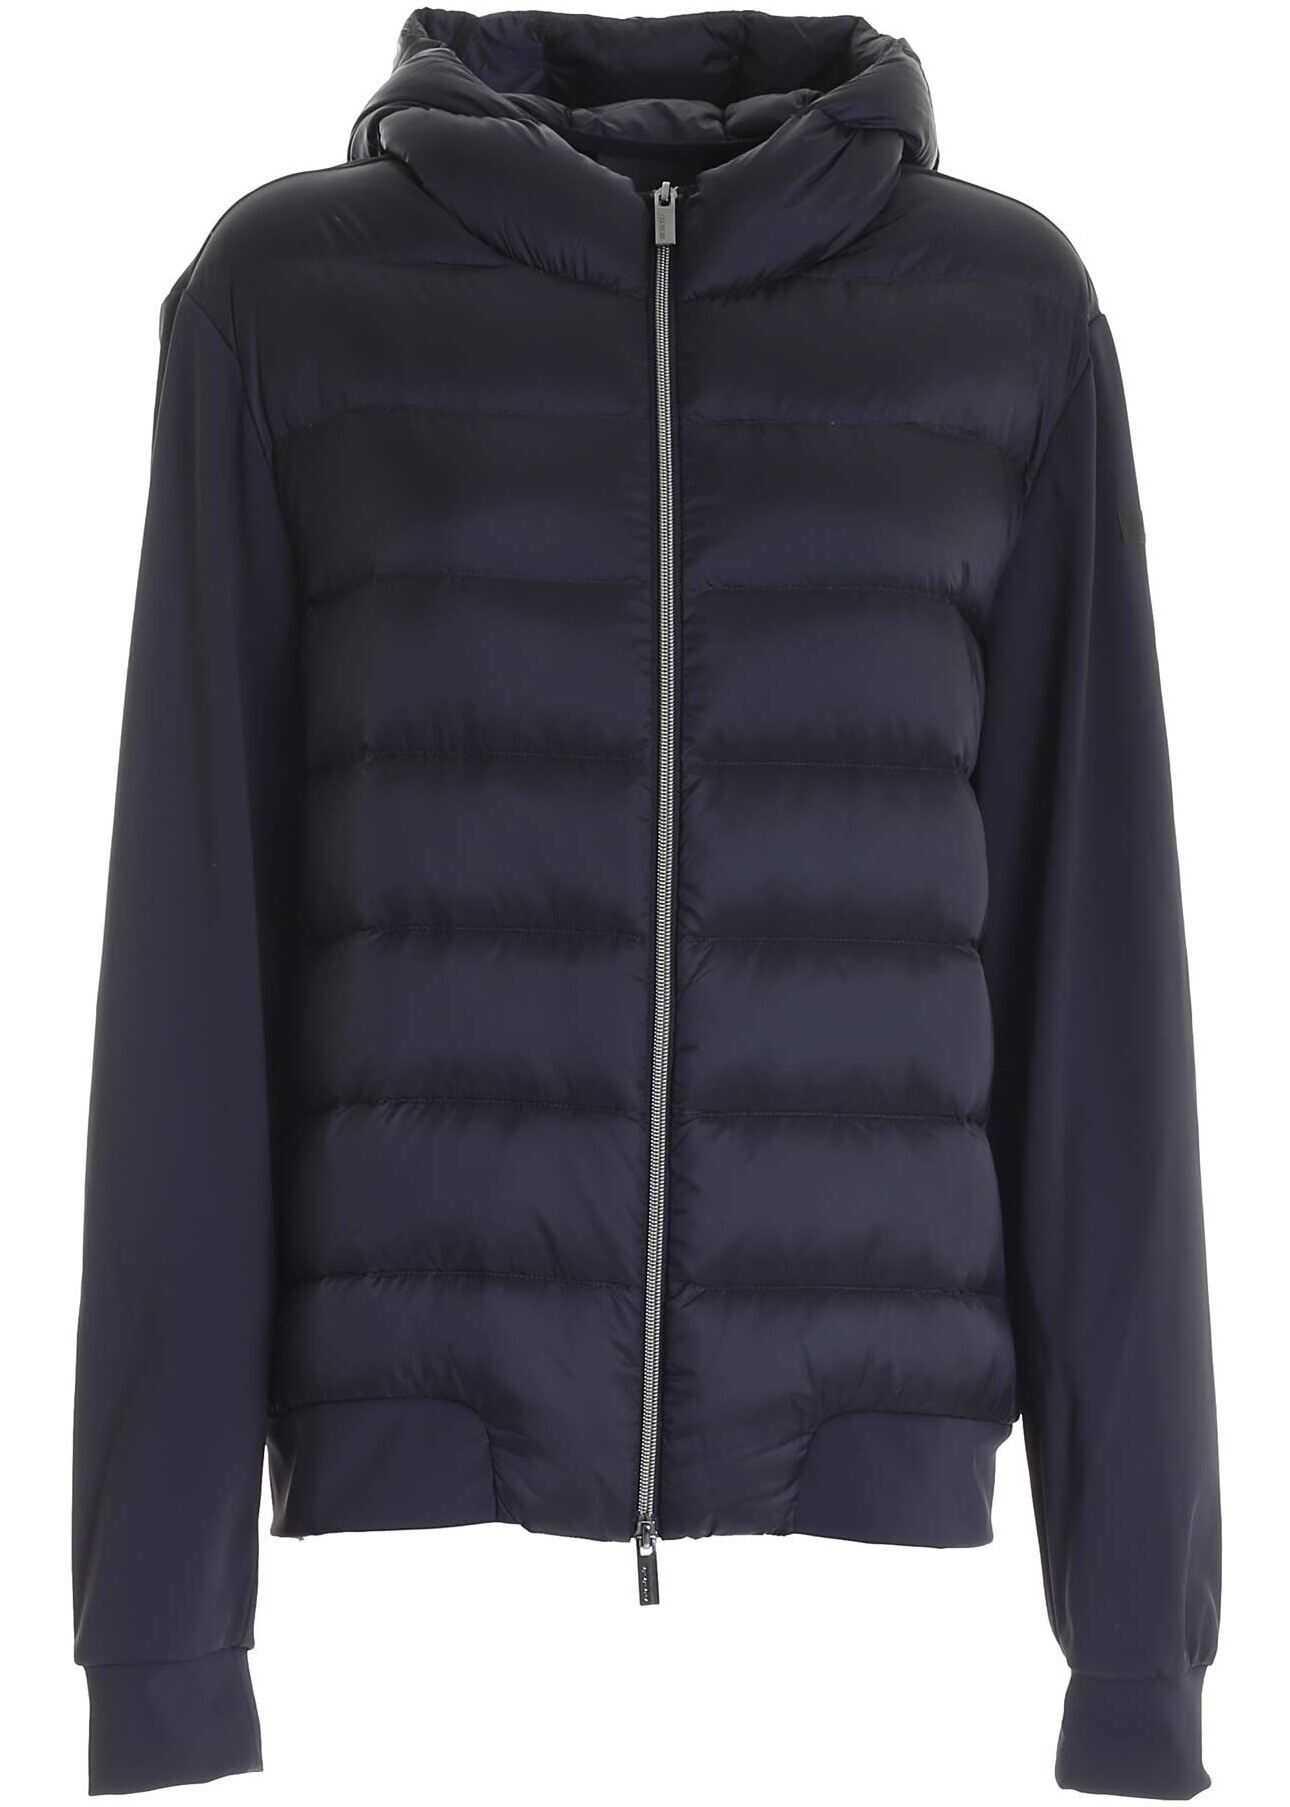 RRD Roberto Ricci Designs Hybrid Padded Sweater In Dark Blue Blue imagine